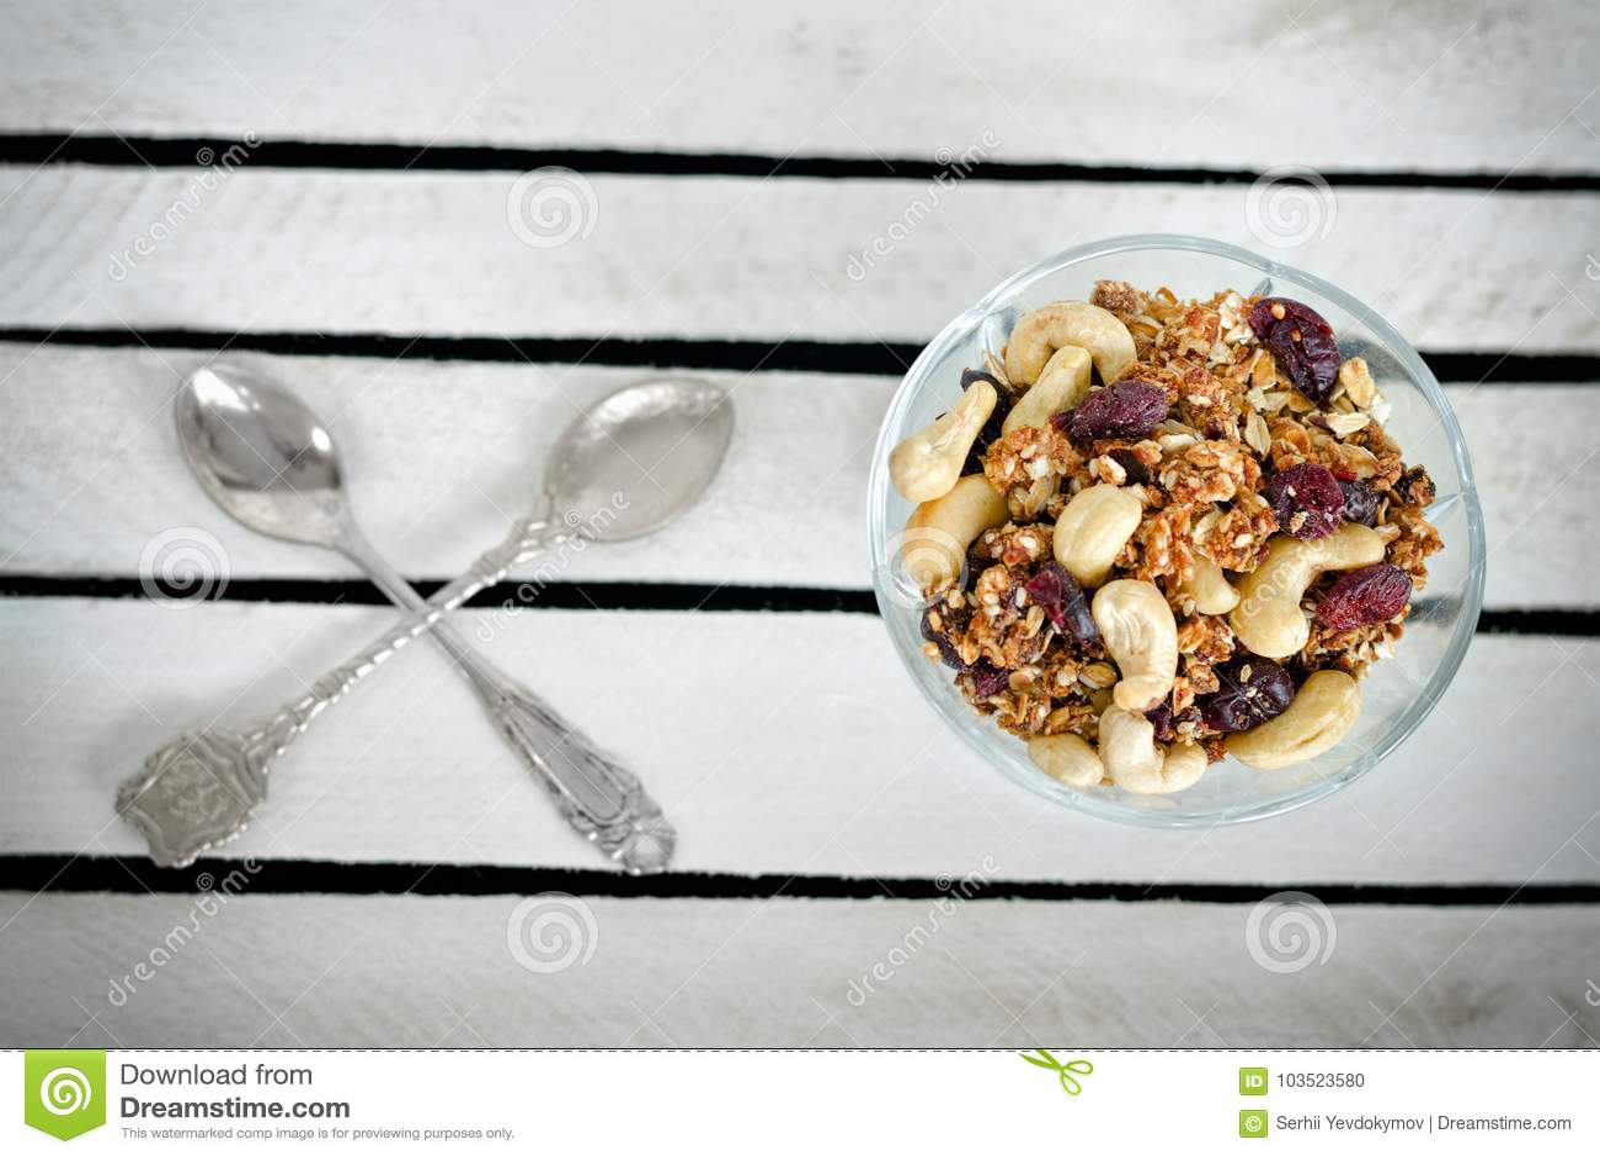 Piala με το granola και δύο διασχισμένα κουτάλια σε ένα άσπρο ξύλινο κιβώτιο